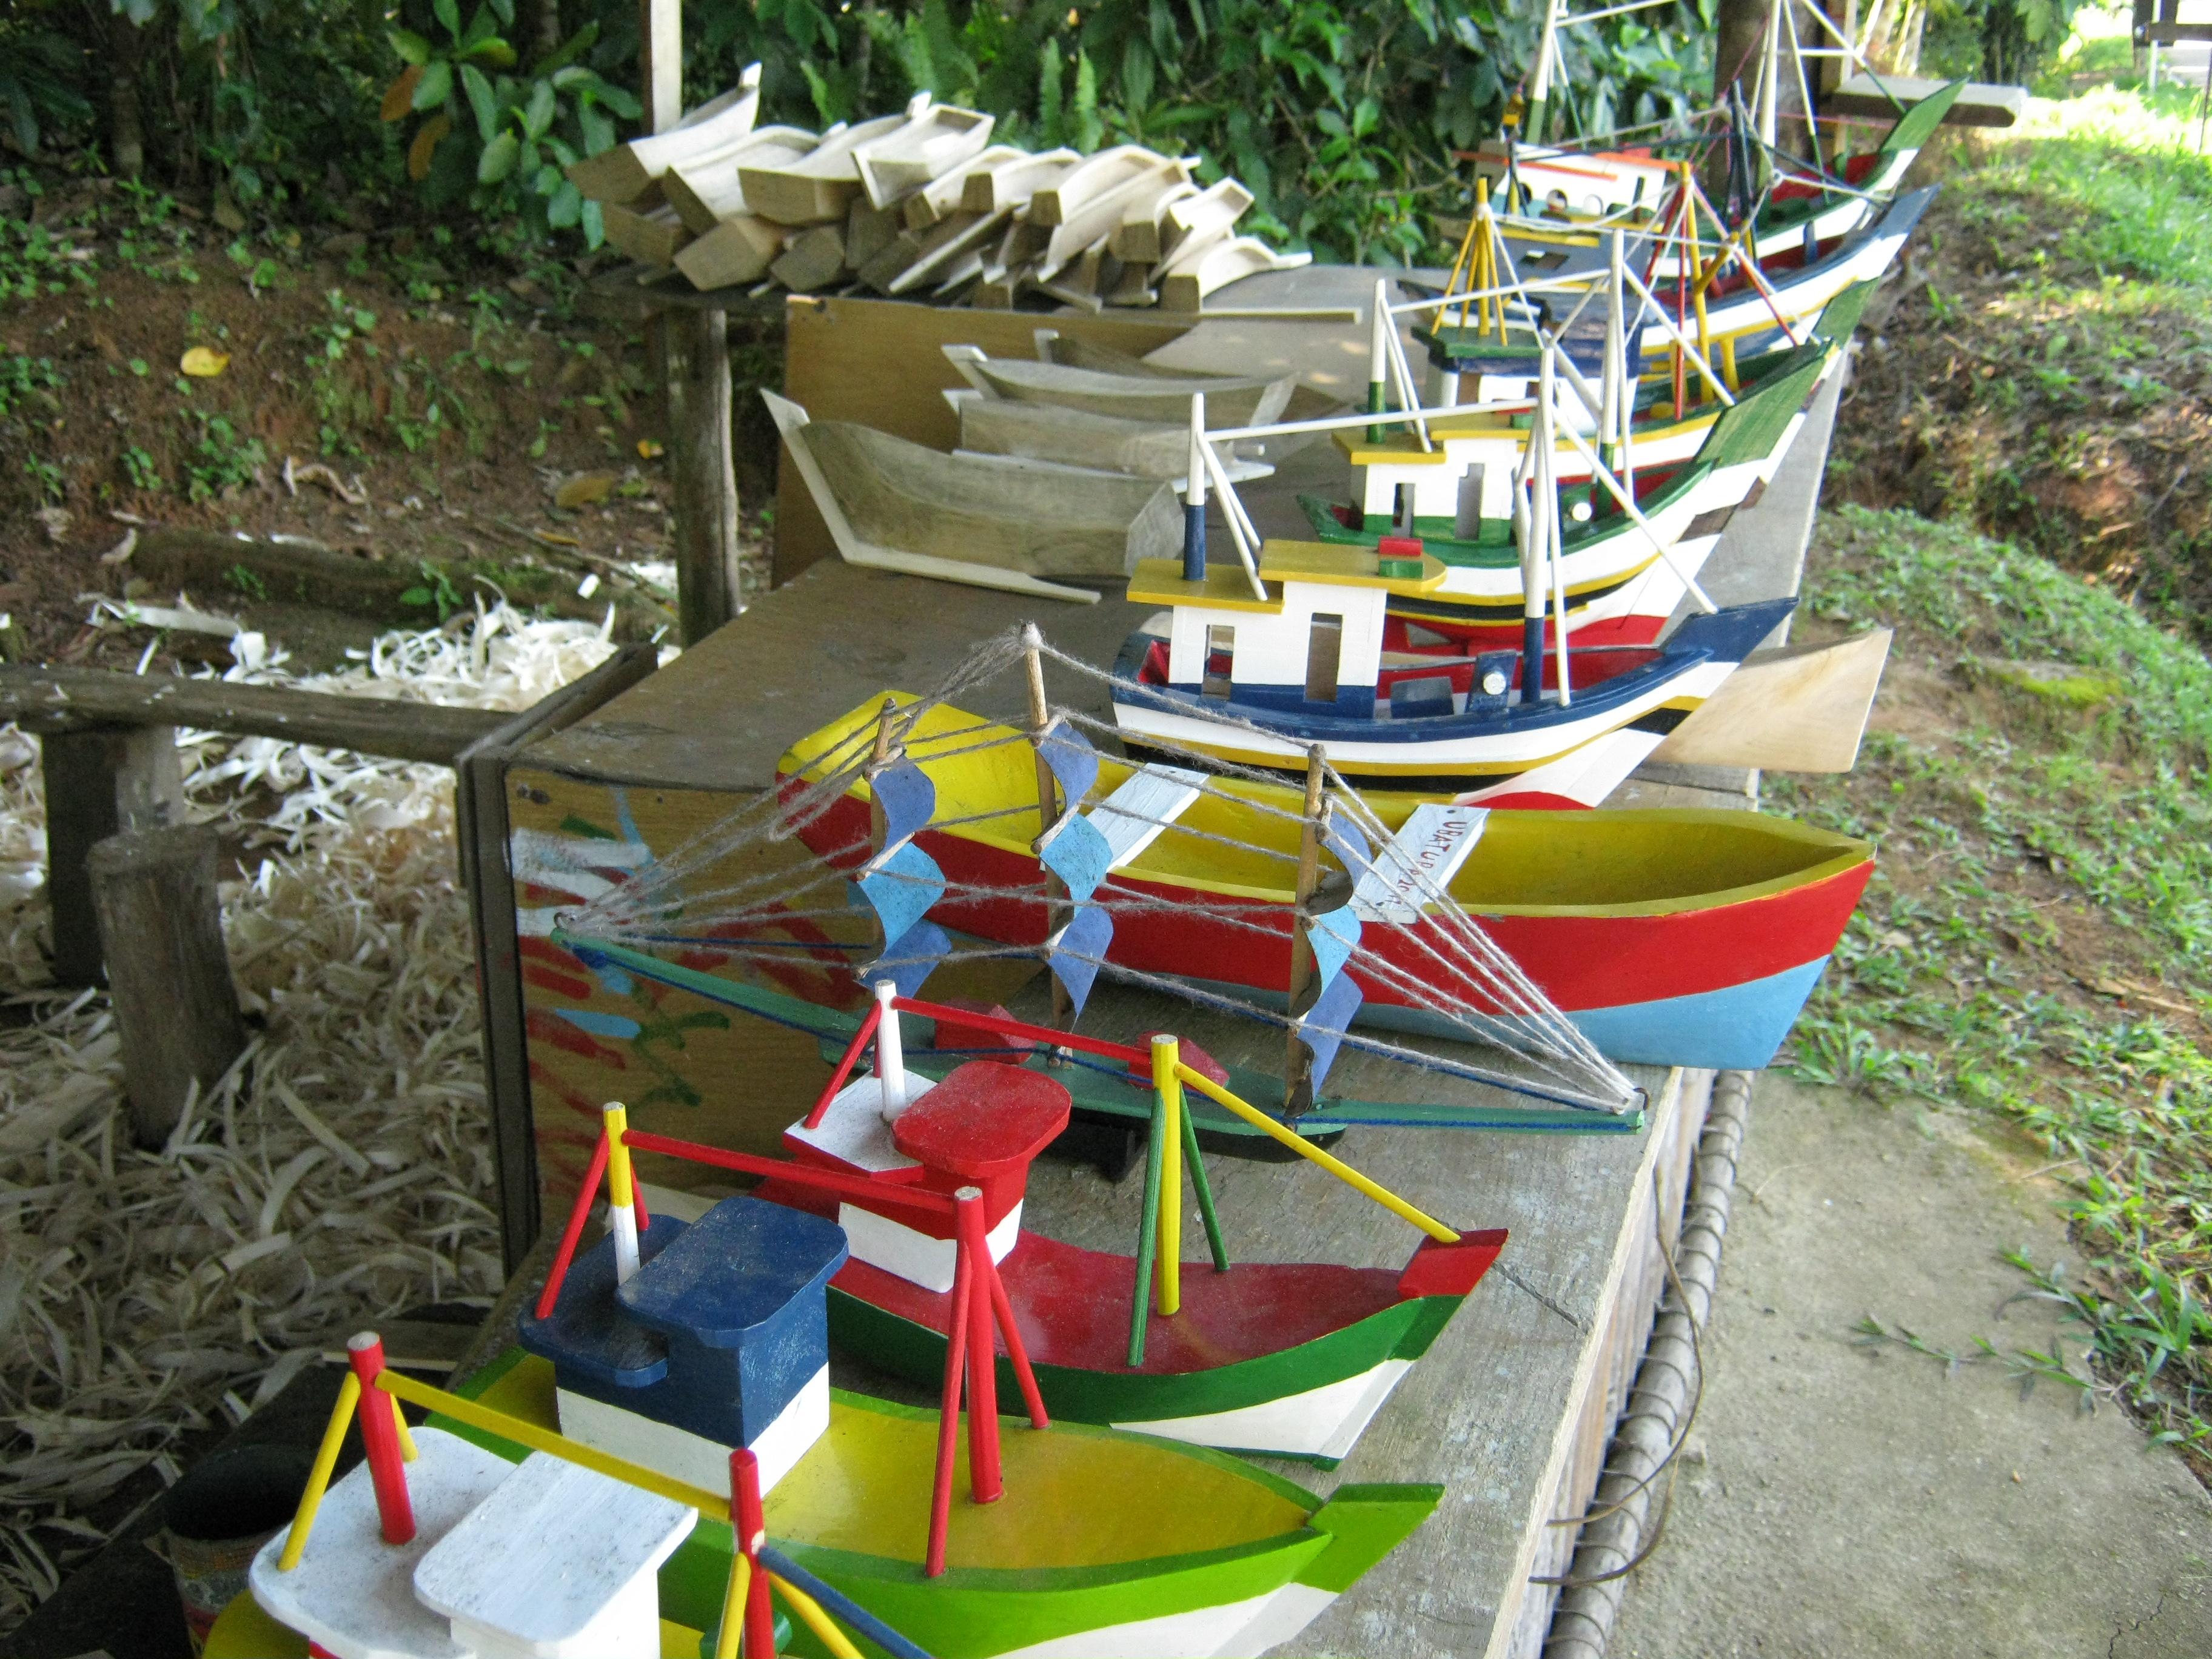 Aparador Inox Madeira ~ File Artesanato Barcos praia do Estaleiro Estrada Rio Santos Ubatuba SP panoramio jpg